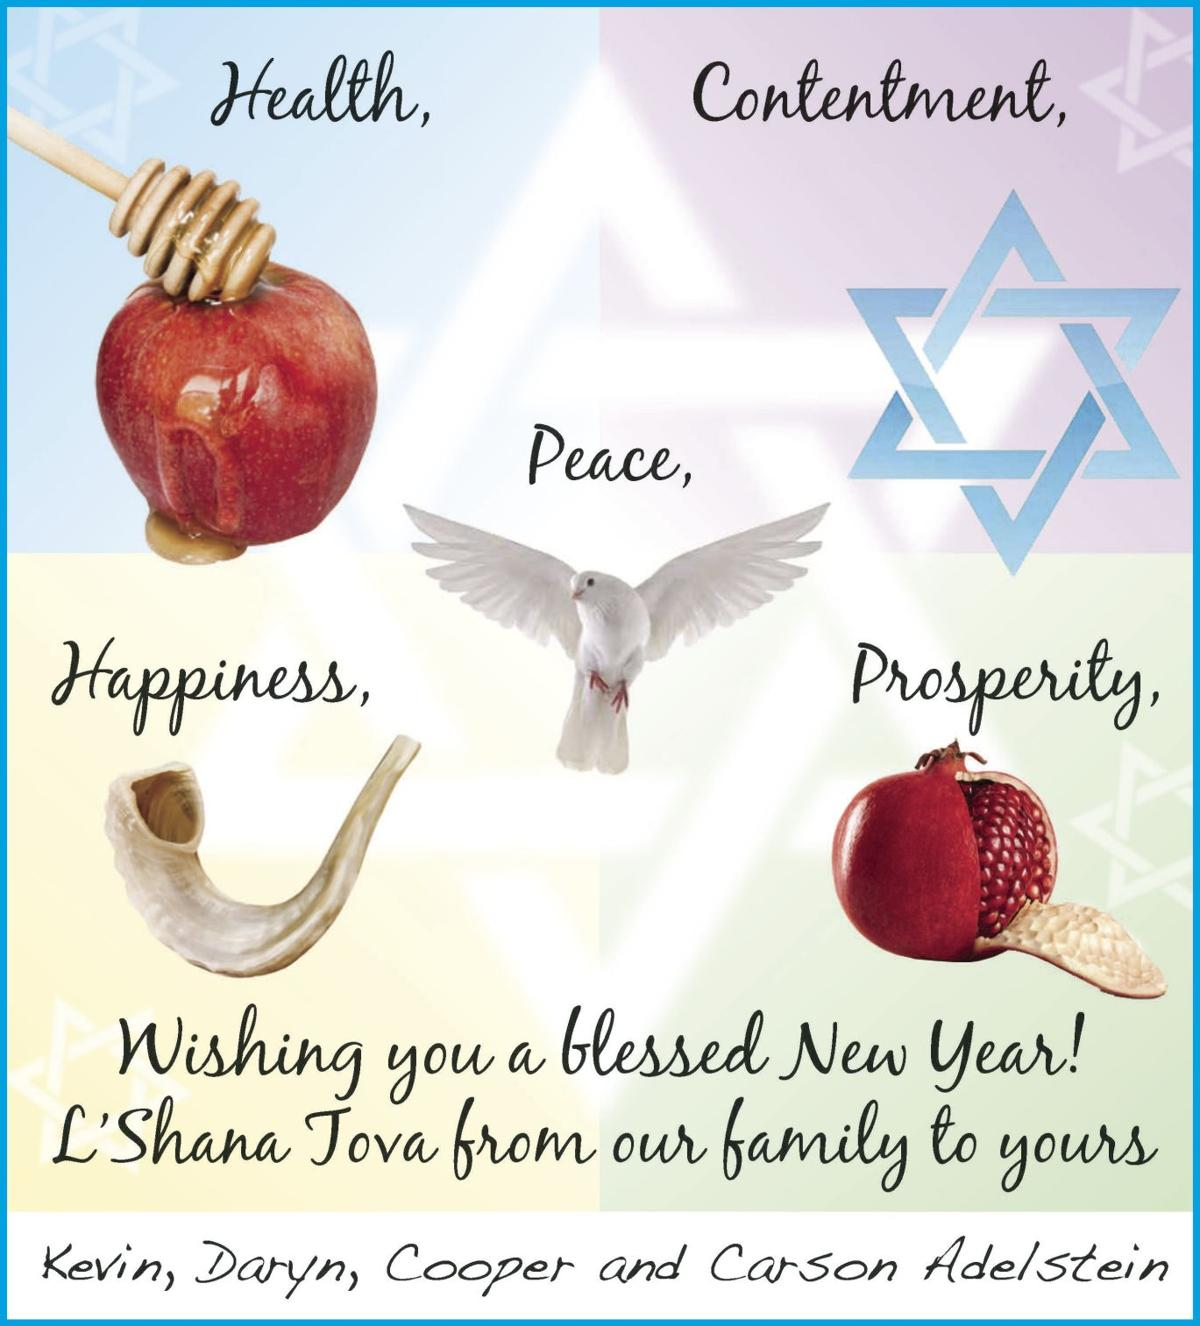 Rosh Hashanah Greetings Industrifo